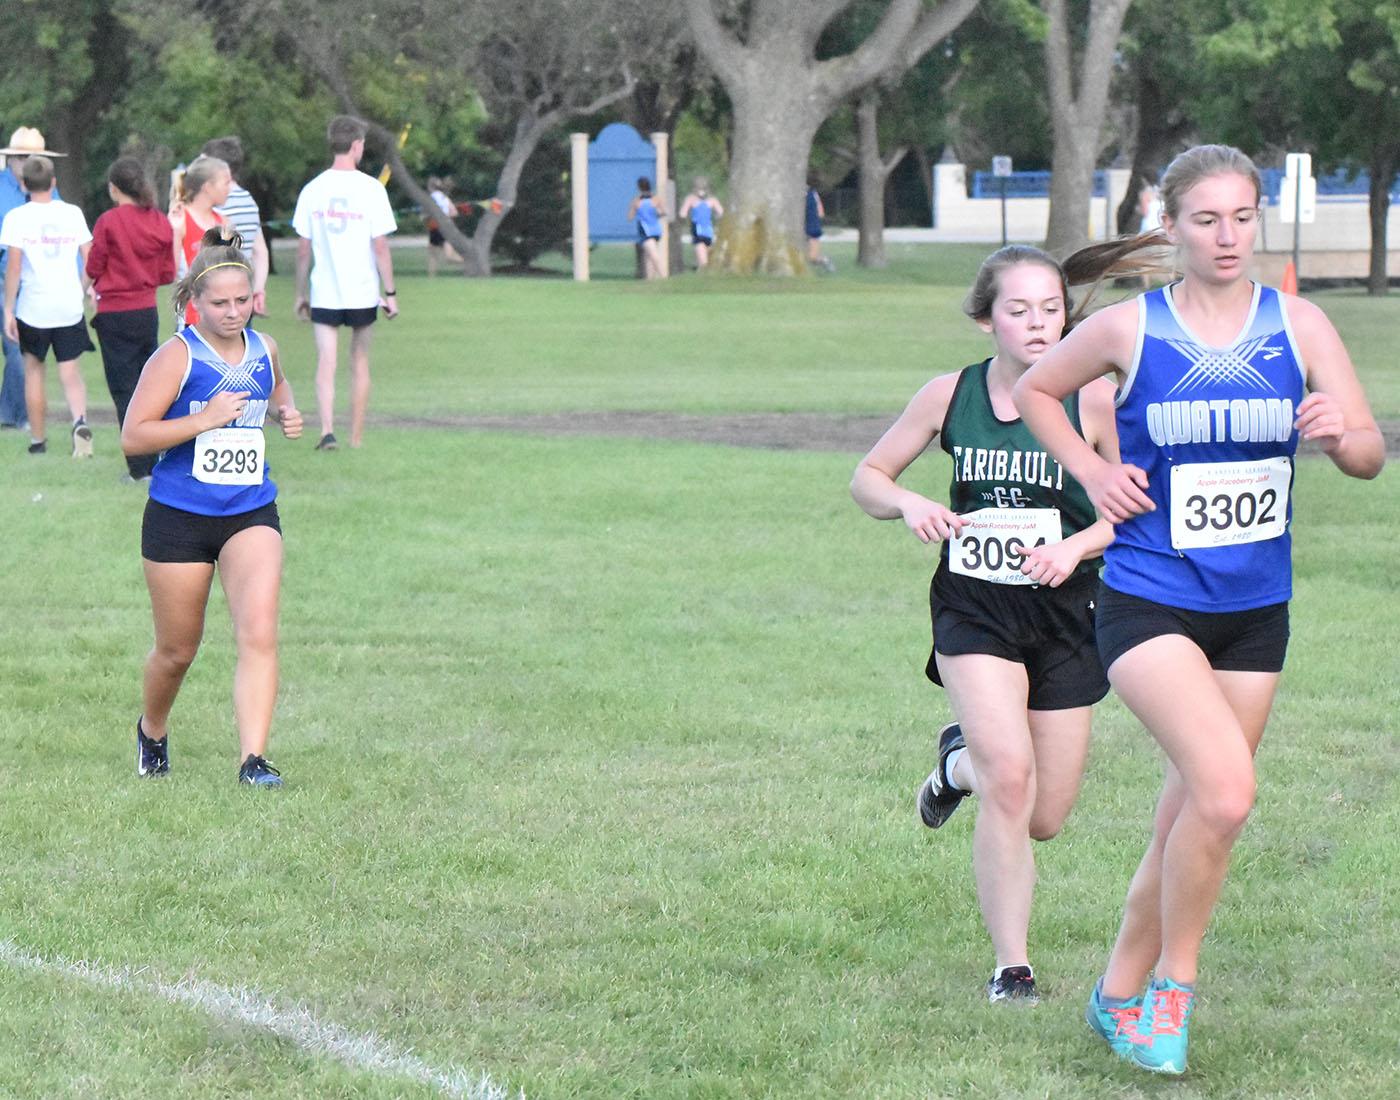 Sophomore Betsy Wunderlich and Senior Chloe Schmidt running during the Faribault race